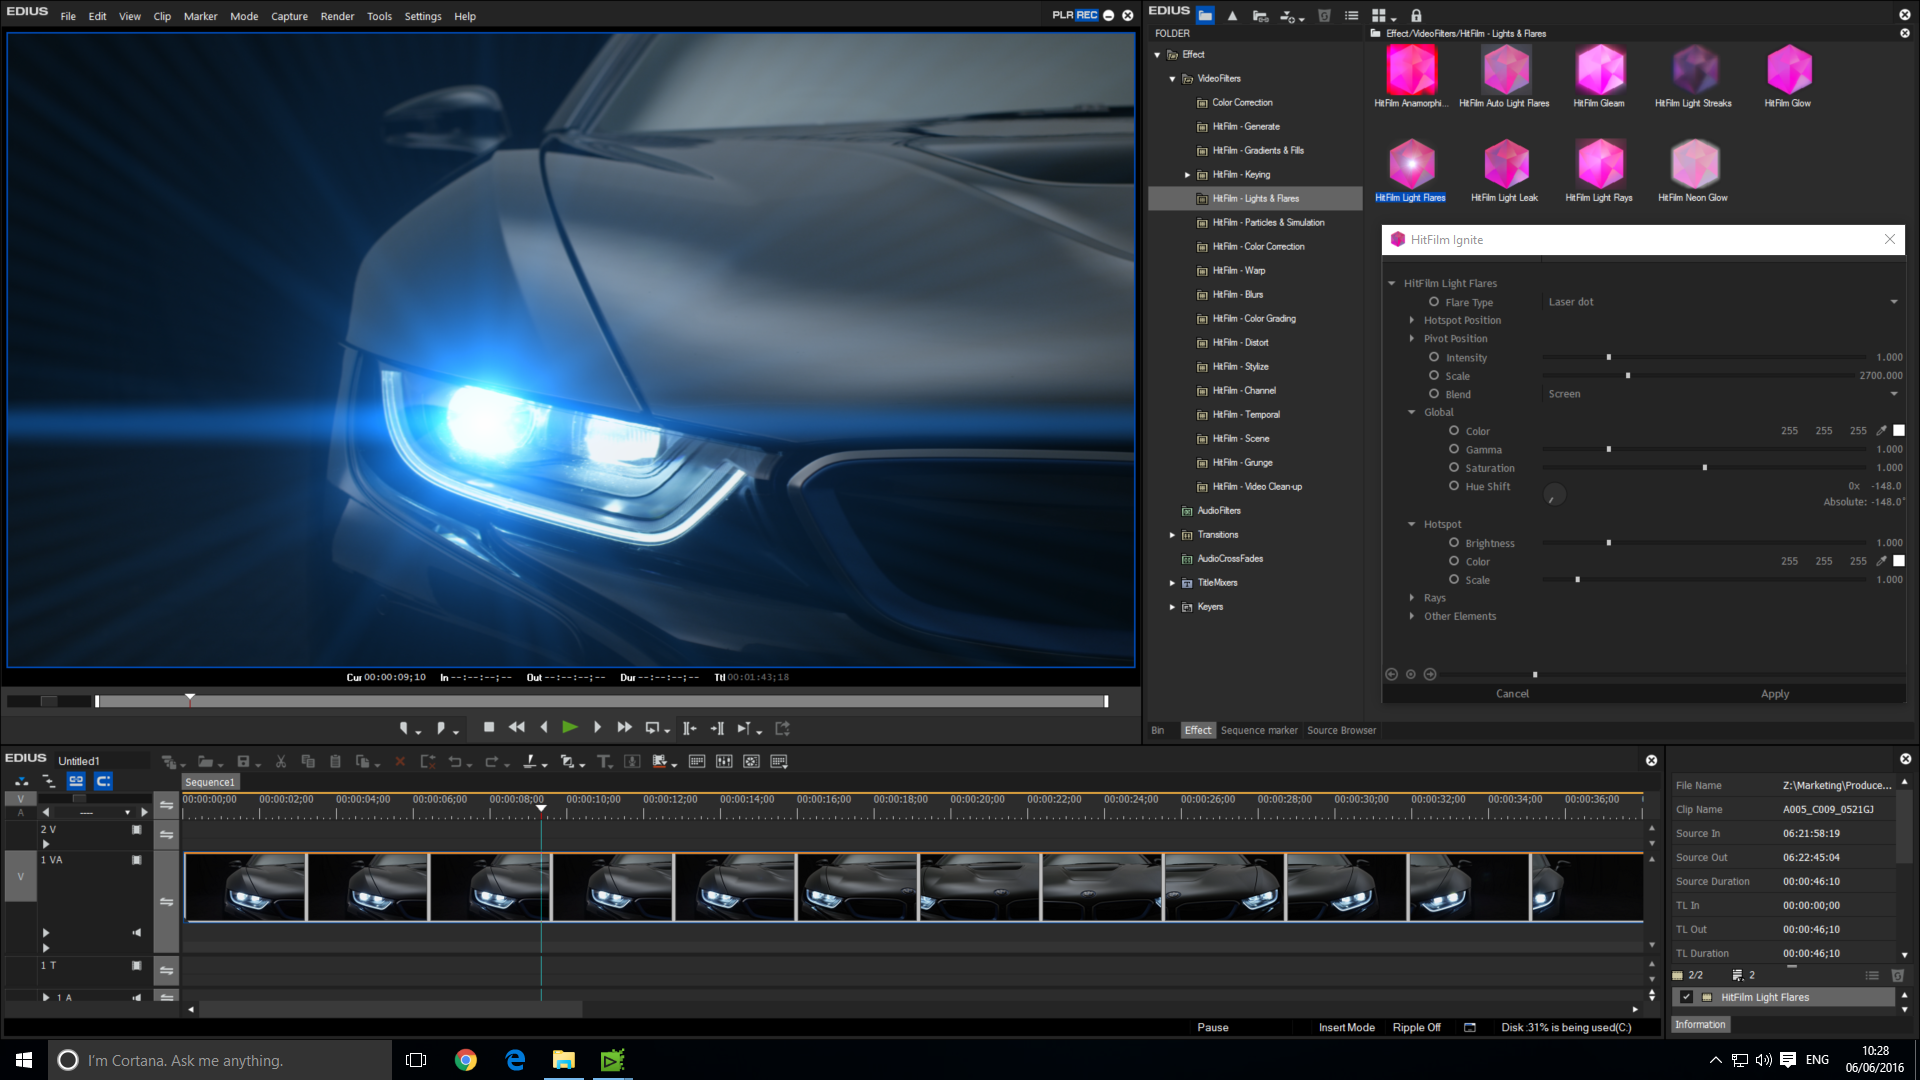 Hitfilm Ignite in EDIUS 8 - Screenshot 1